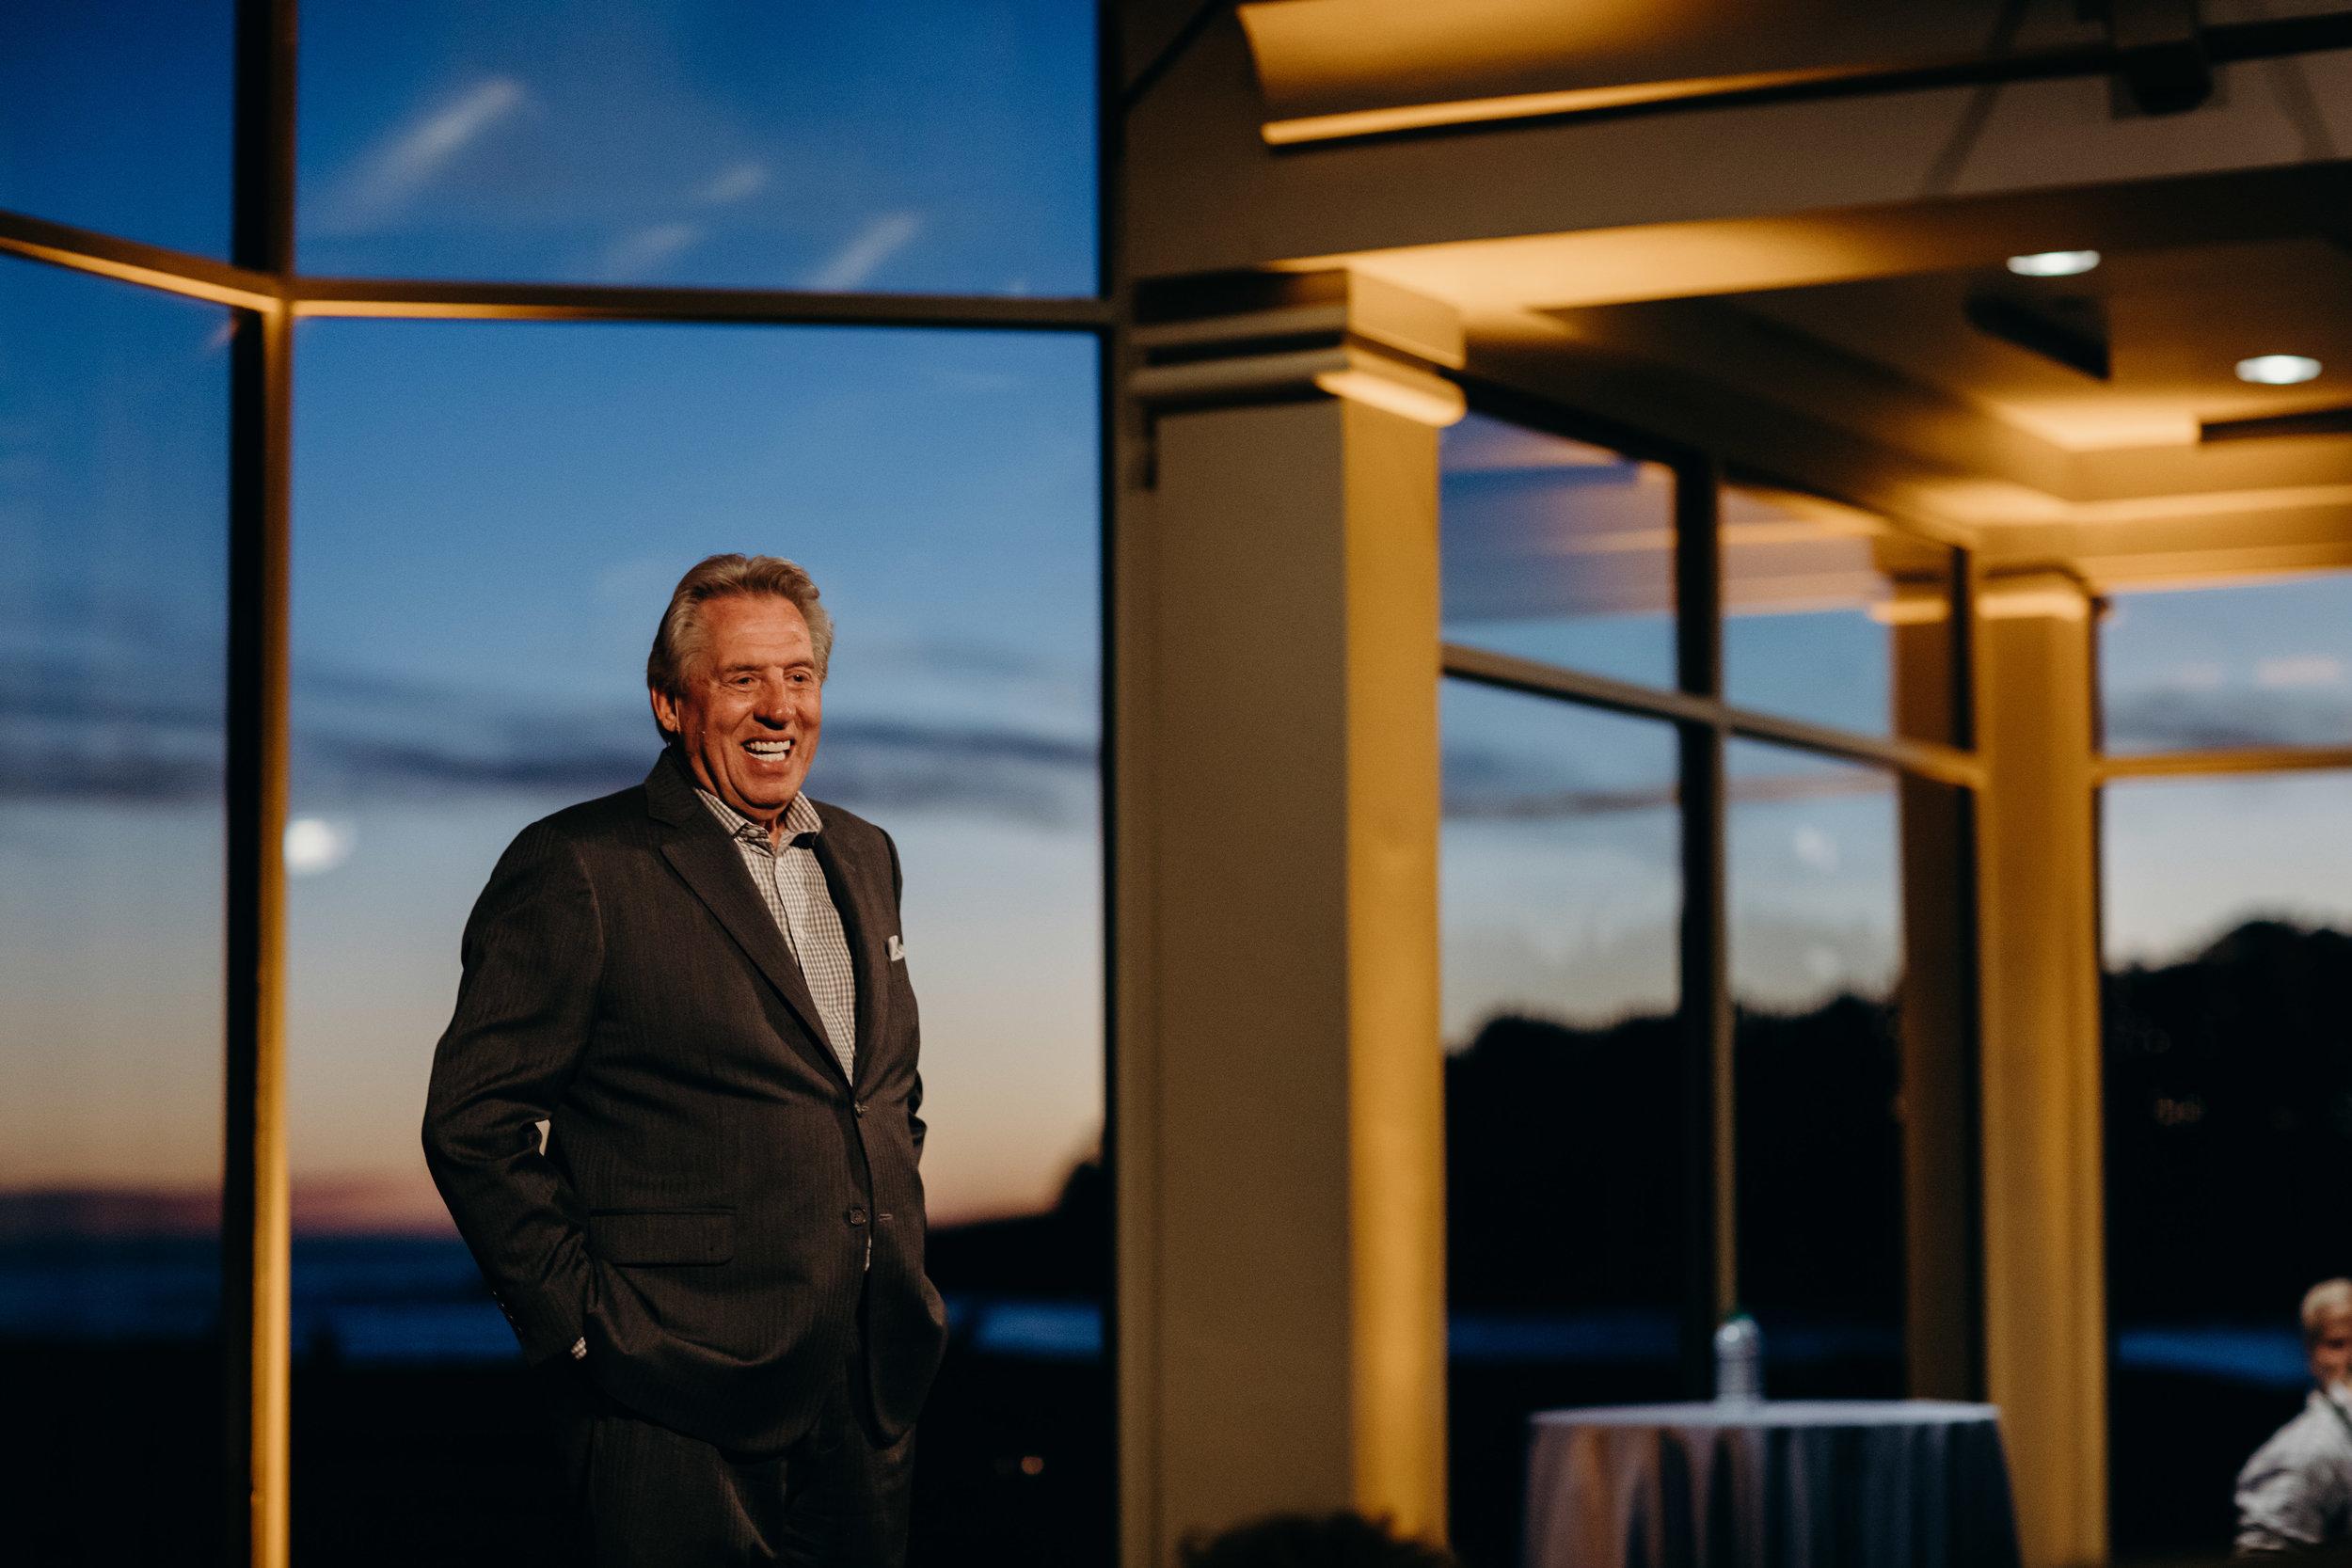 John Maxwell's Leadership Open 2017 at Pebble Beach Resorts